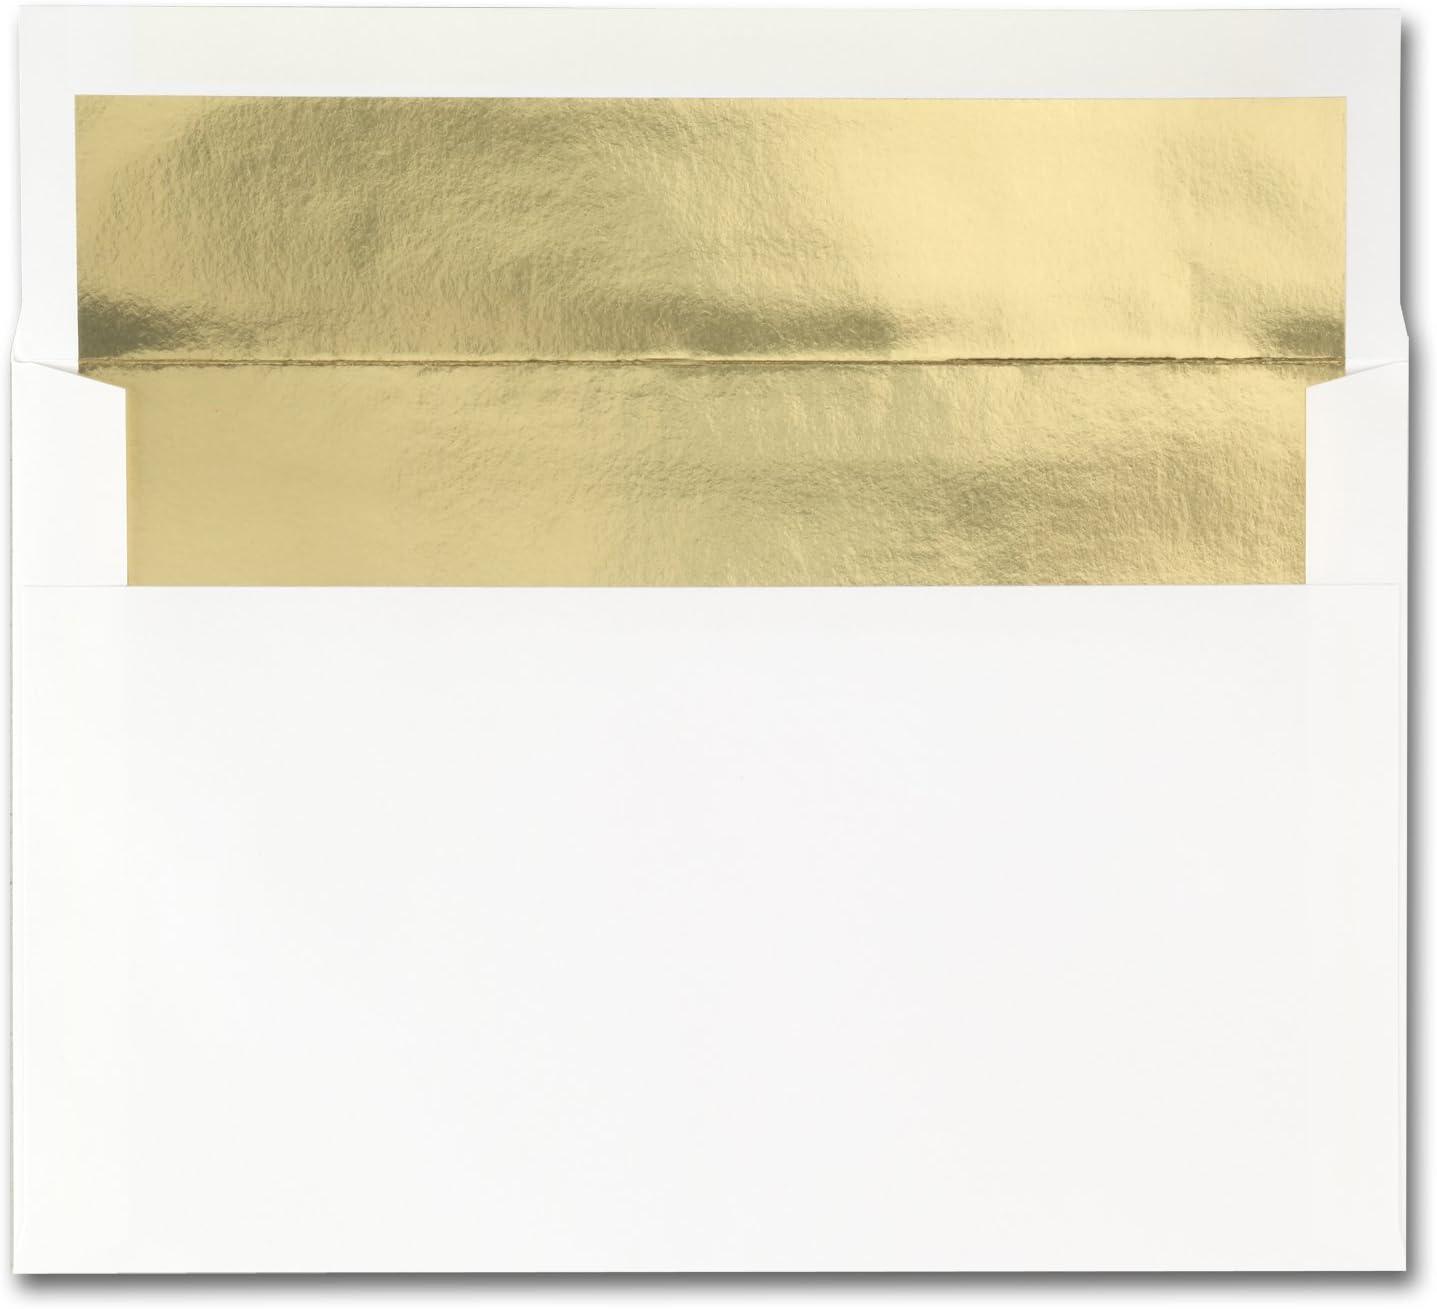 Fine Impressions 250-Count Gold Foil-Lined 正規取扱店 I White 新着 for Envelopes